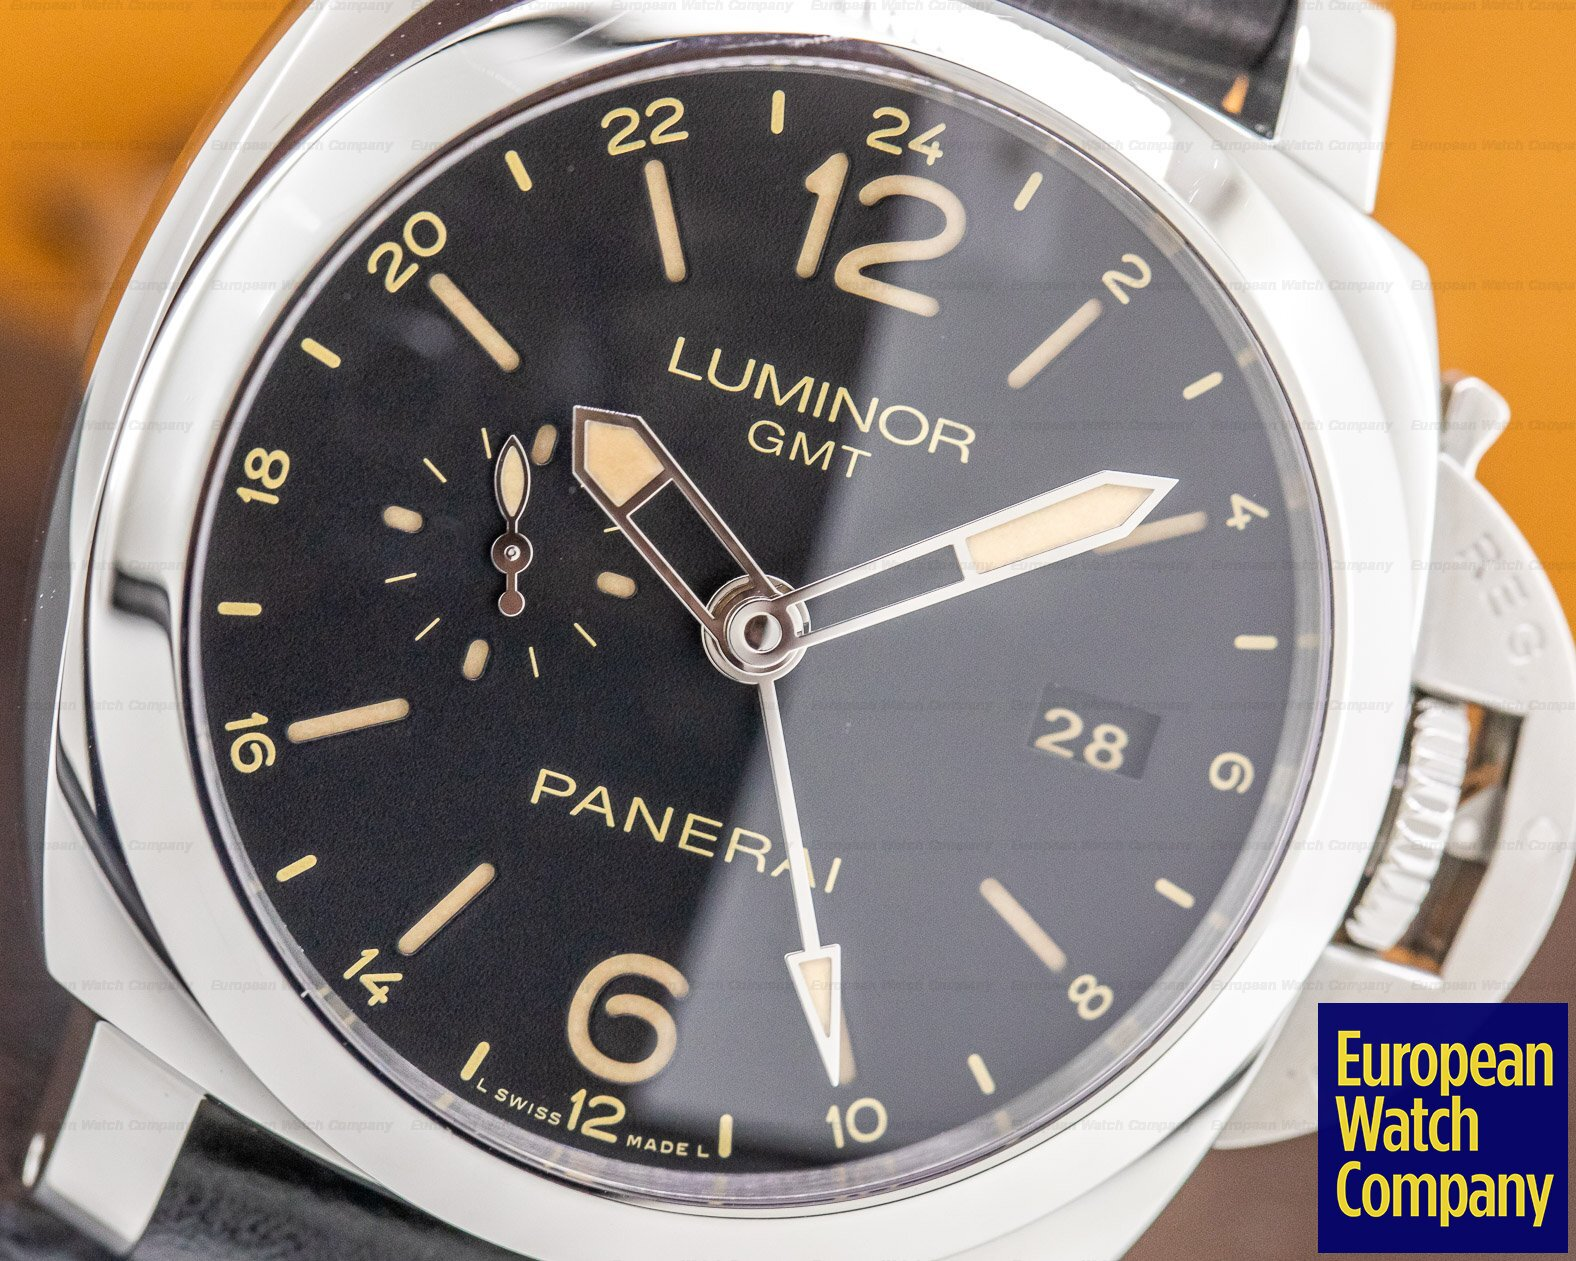 Panerai PAM00531 Luminor 1950 3 Dauys GMT 24H Automatic 44mm